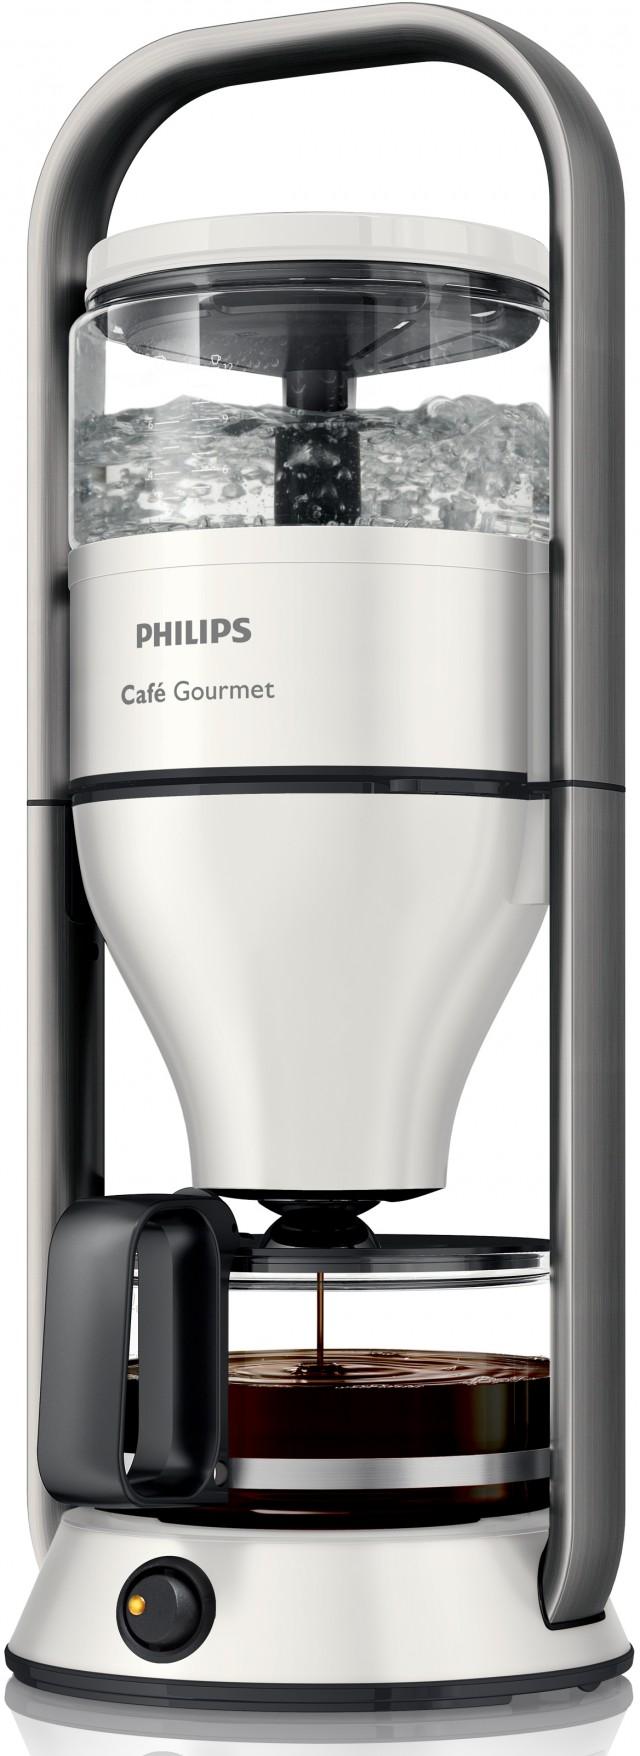 Philips Kaffeemaschine Café Gourmet HD5407/10 mit Direkt-Brüh-Prinzip